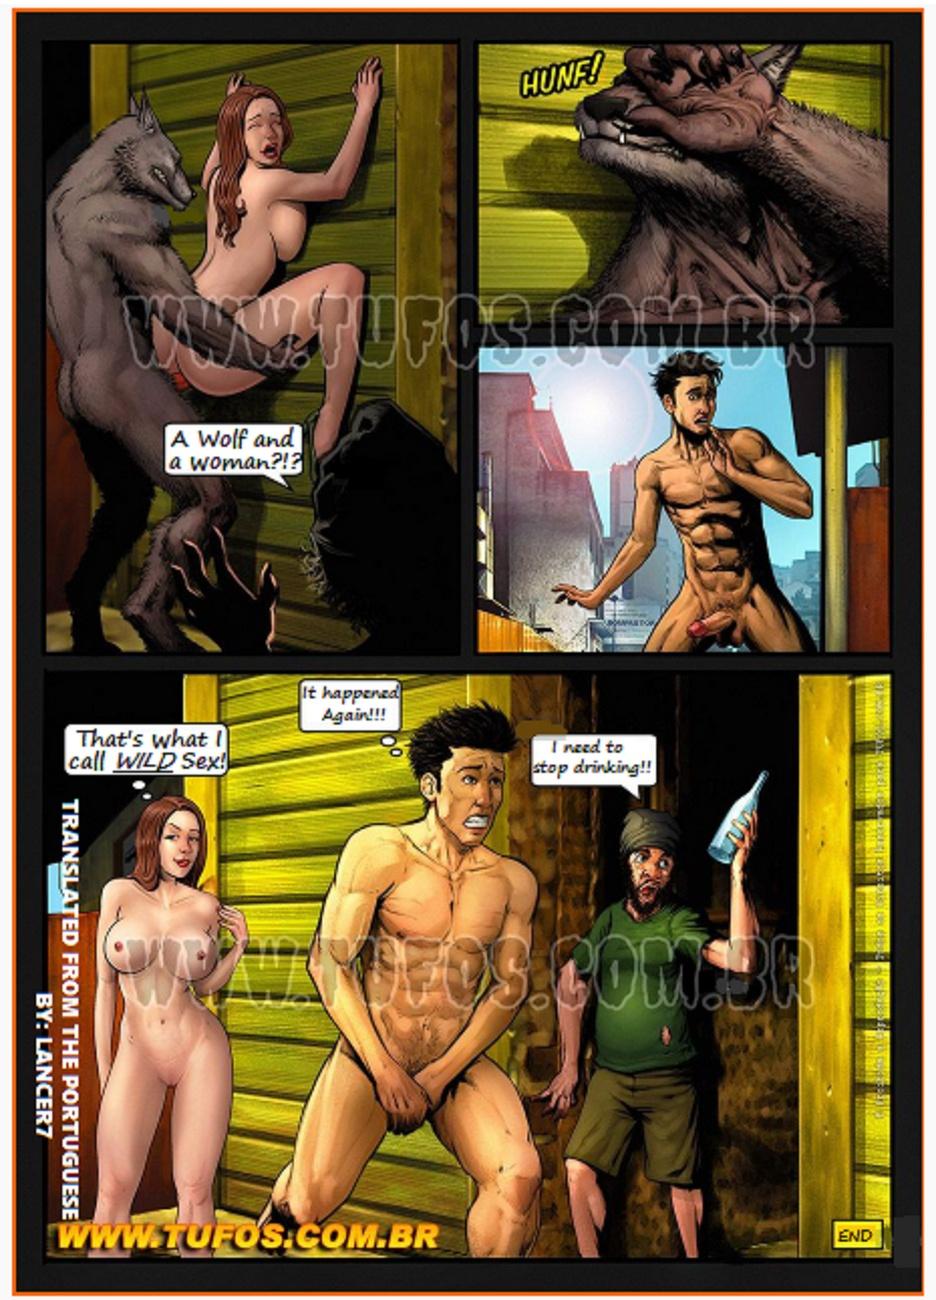 Wolfman sex videa hardcore movies